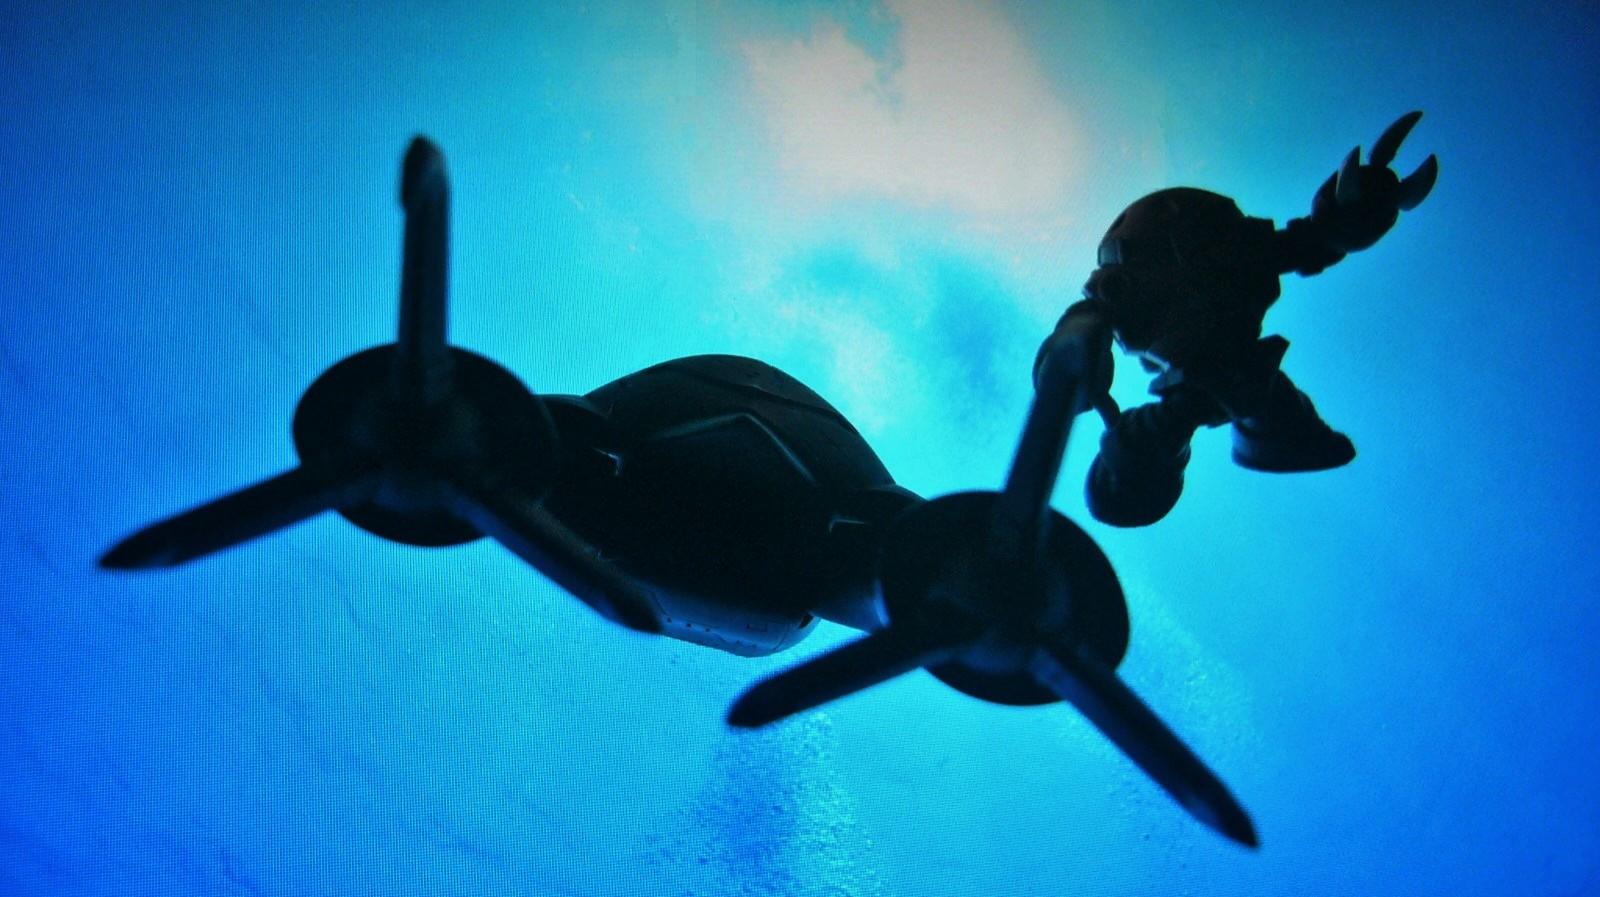 SDガンダム underwater ガシャポン戦士DASH ガシャポン戦士NEXT  実写 水中 デジラマ ズゴック アッガイ グラブロ ゴック 水中での行動が可能な水陸両用MS